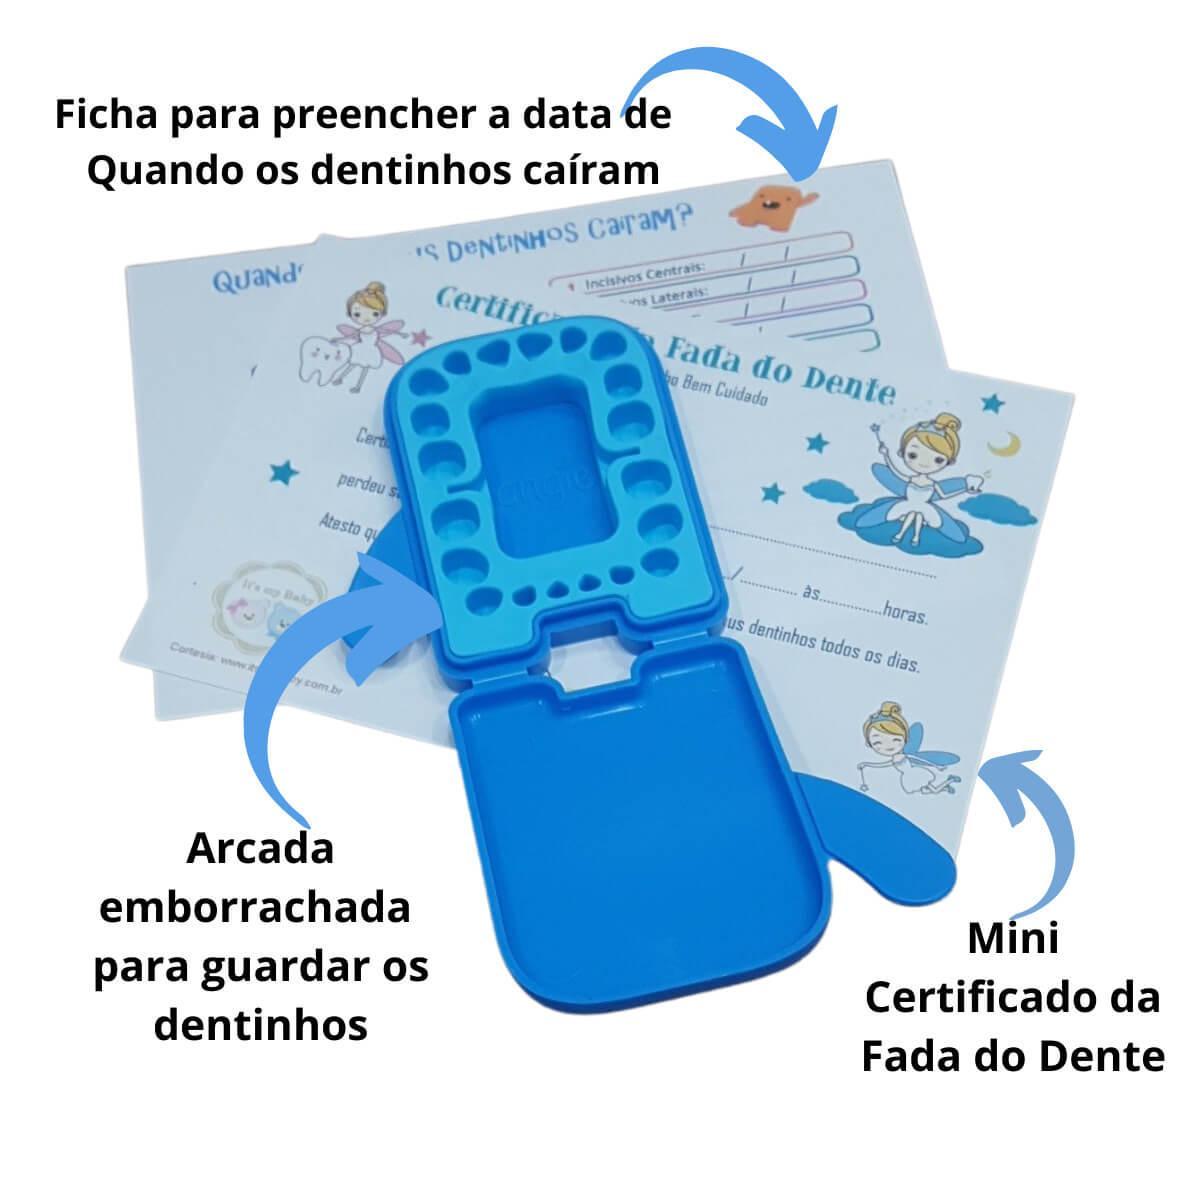 Kit Fada do Dente Azul Angie by Angelus